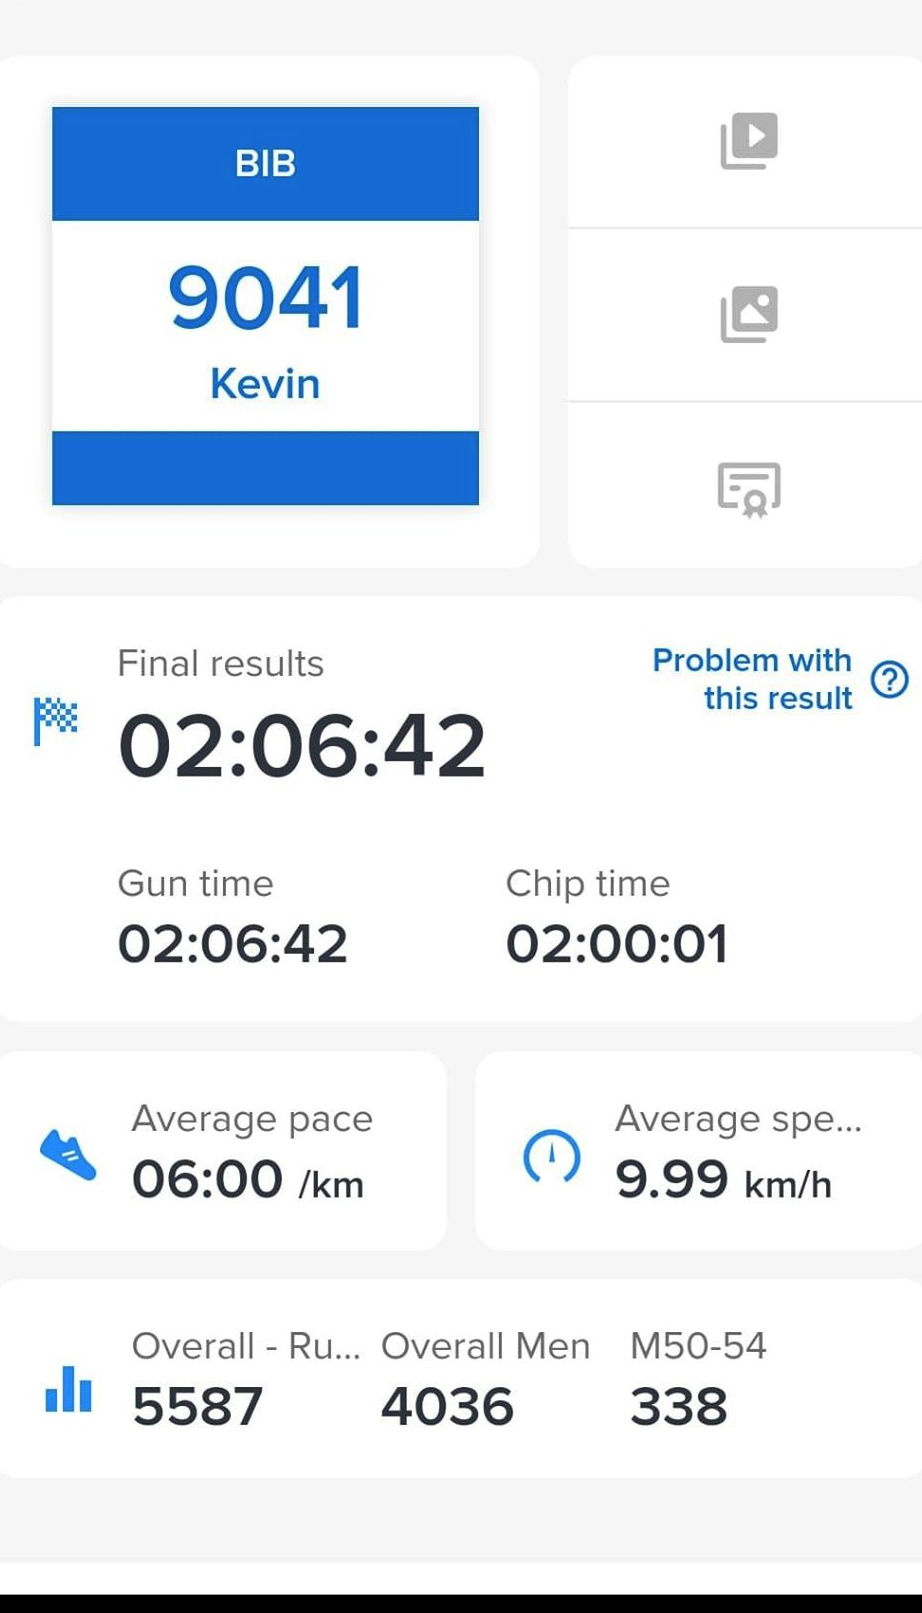 Kevin Millers Bath Half Results